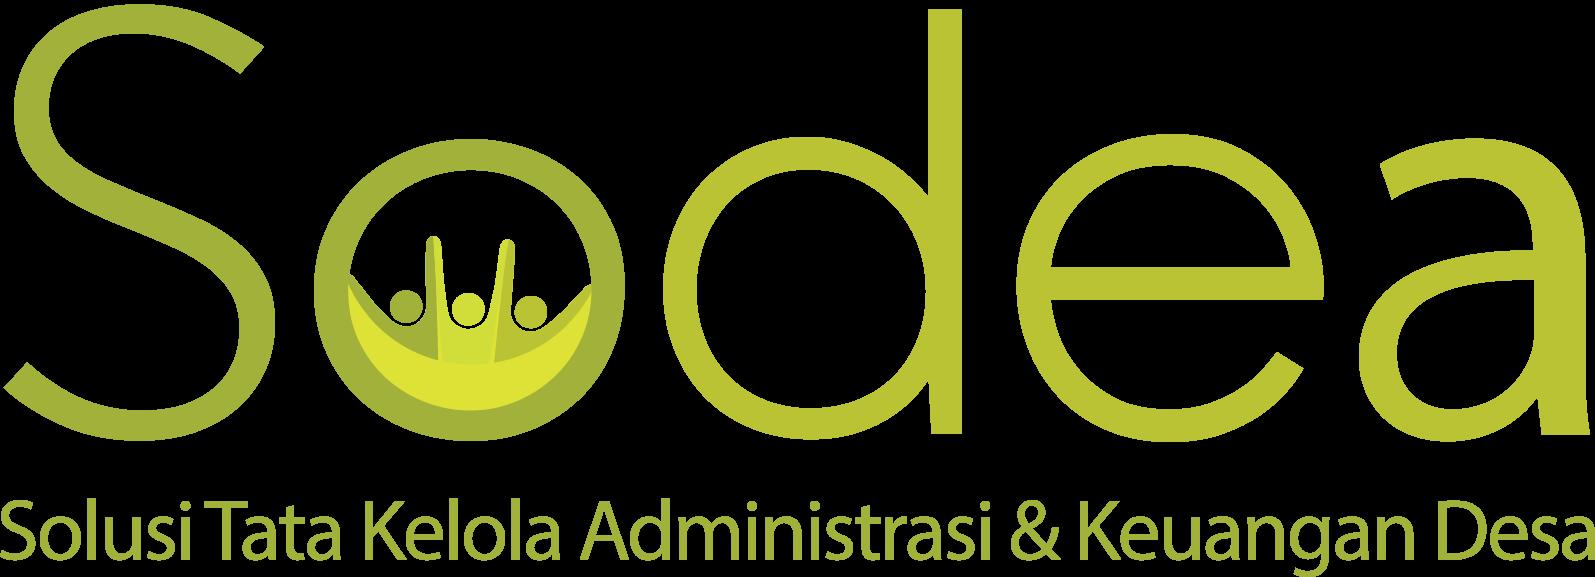 Logo SODEA (Software Desa Arfadia)